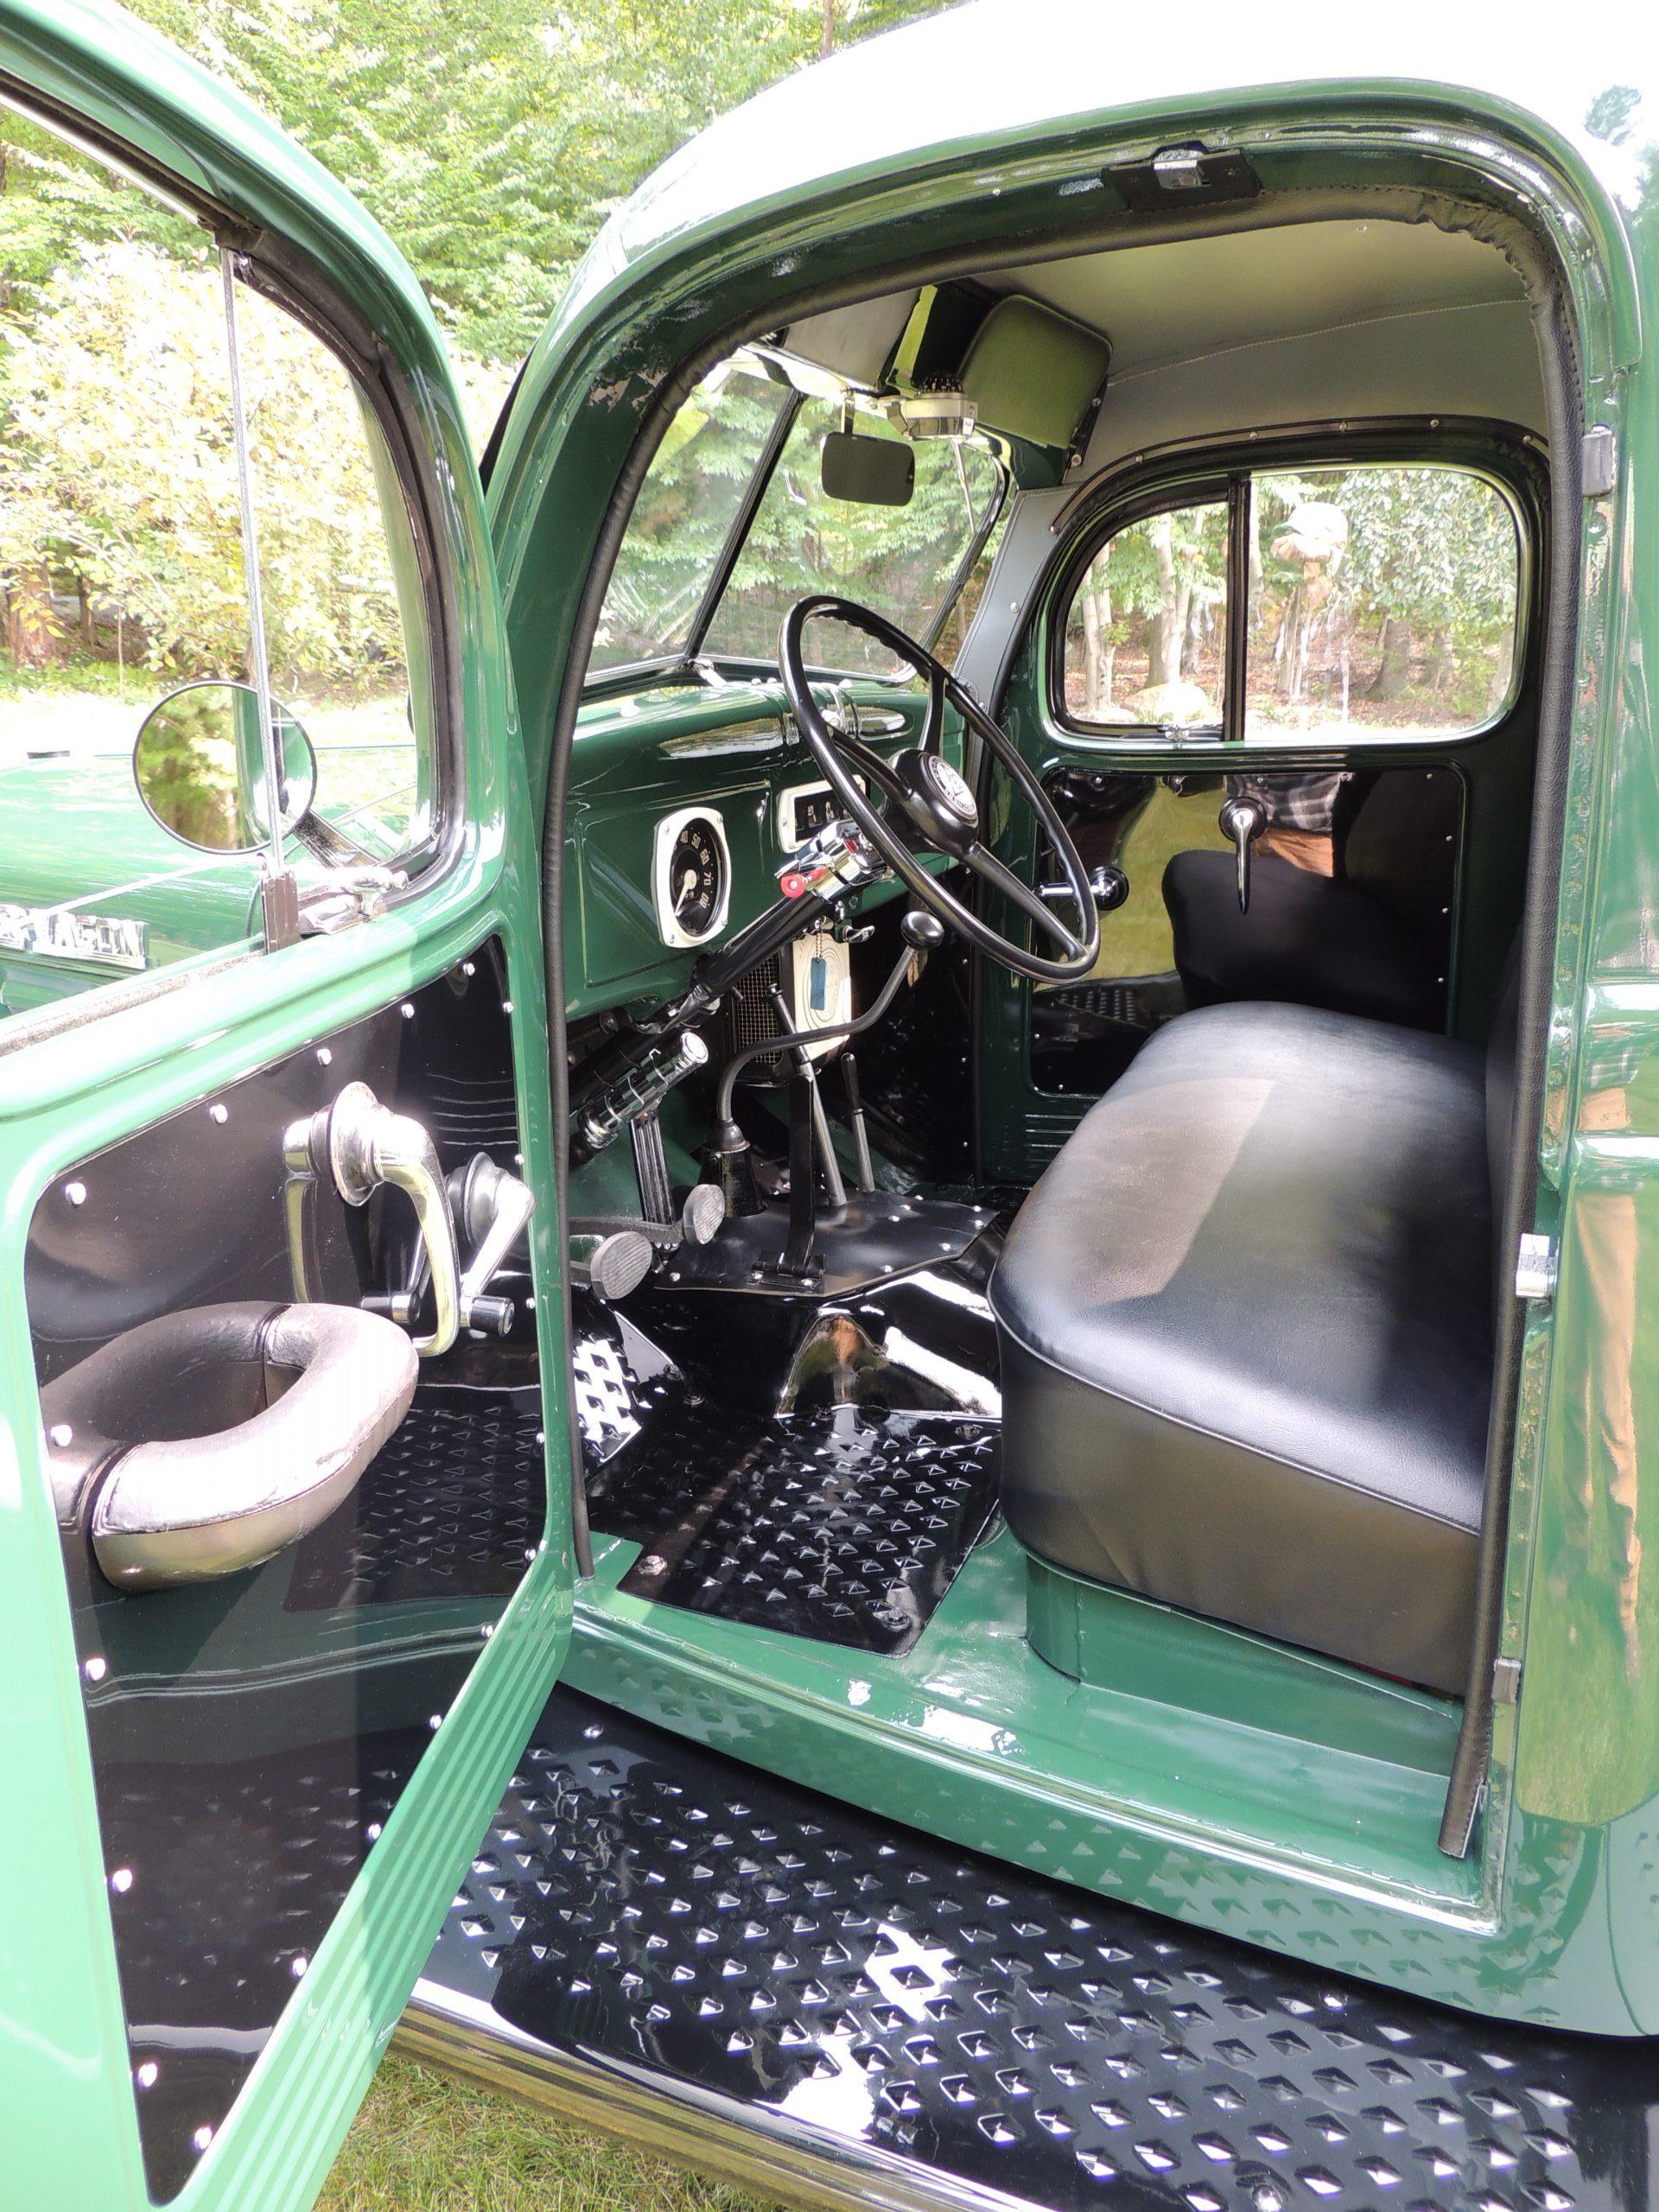 1956 Dodge Power Wagon interior